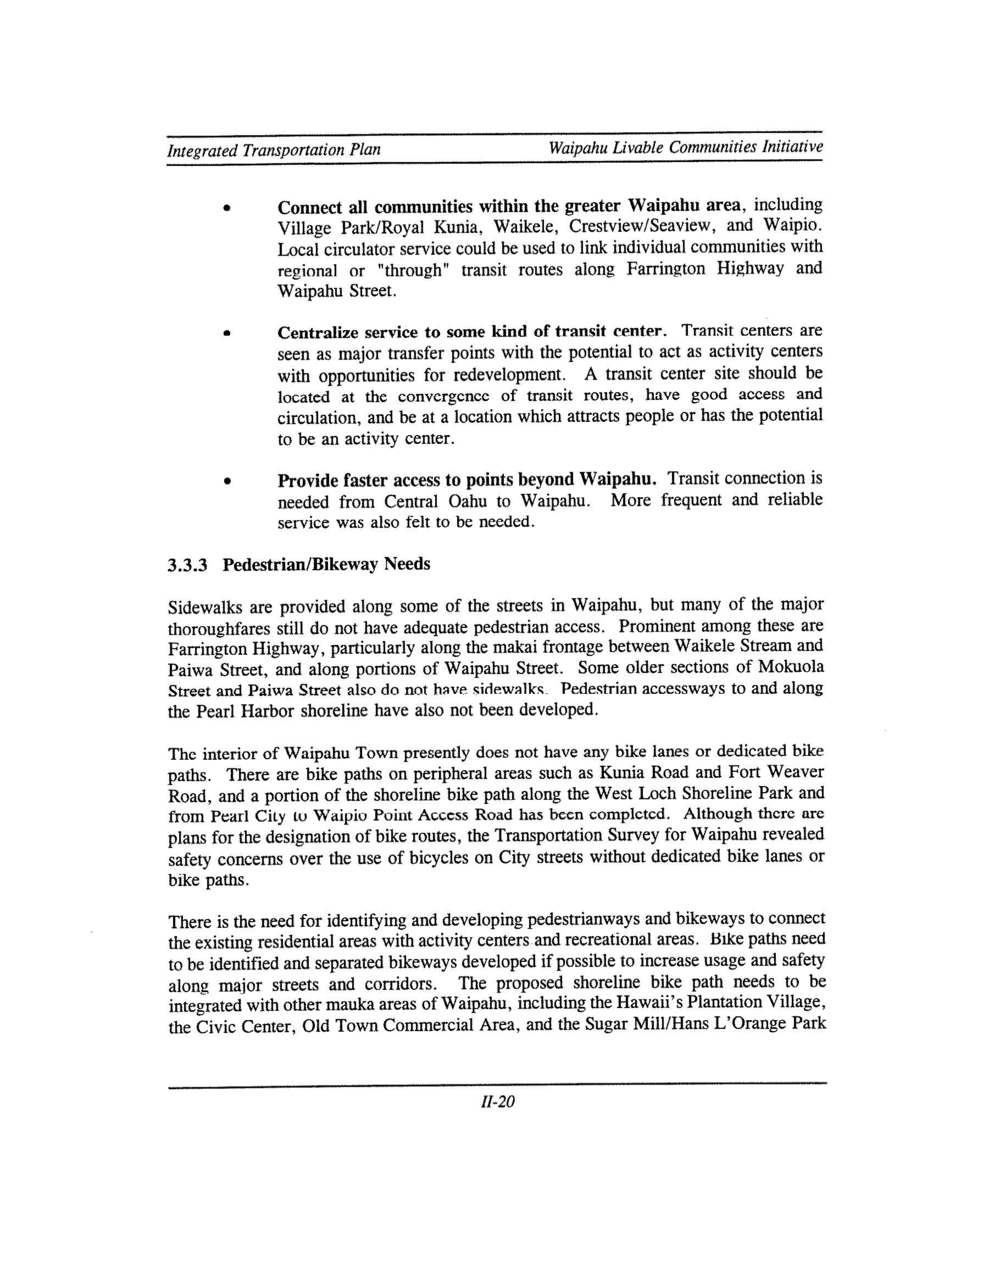 160531_WaipahuLivableCommunities(1998)_Page_035.jpg